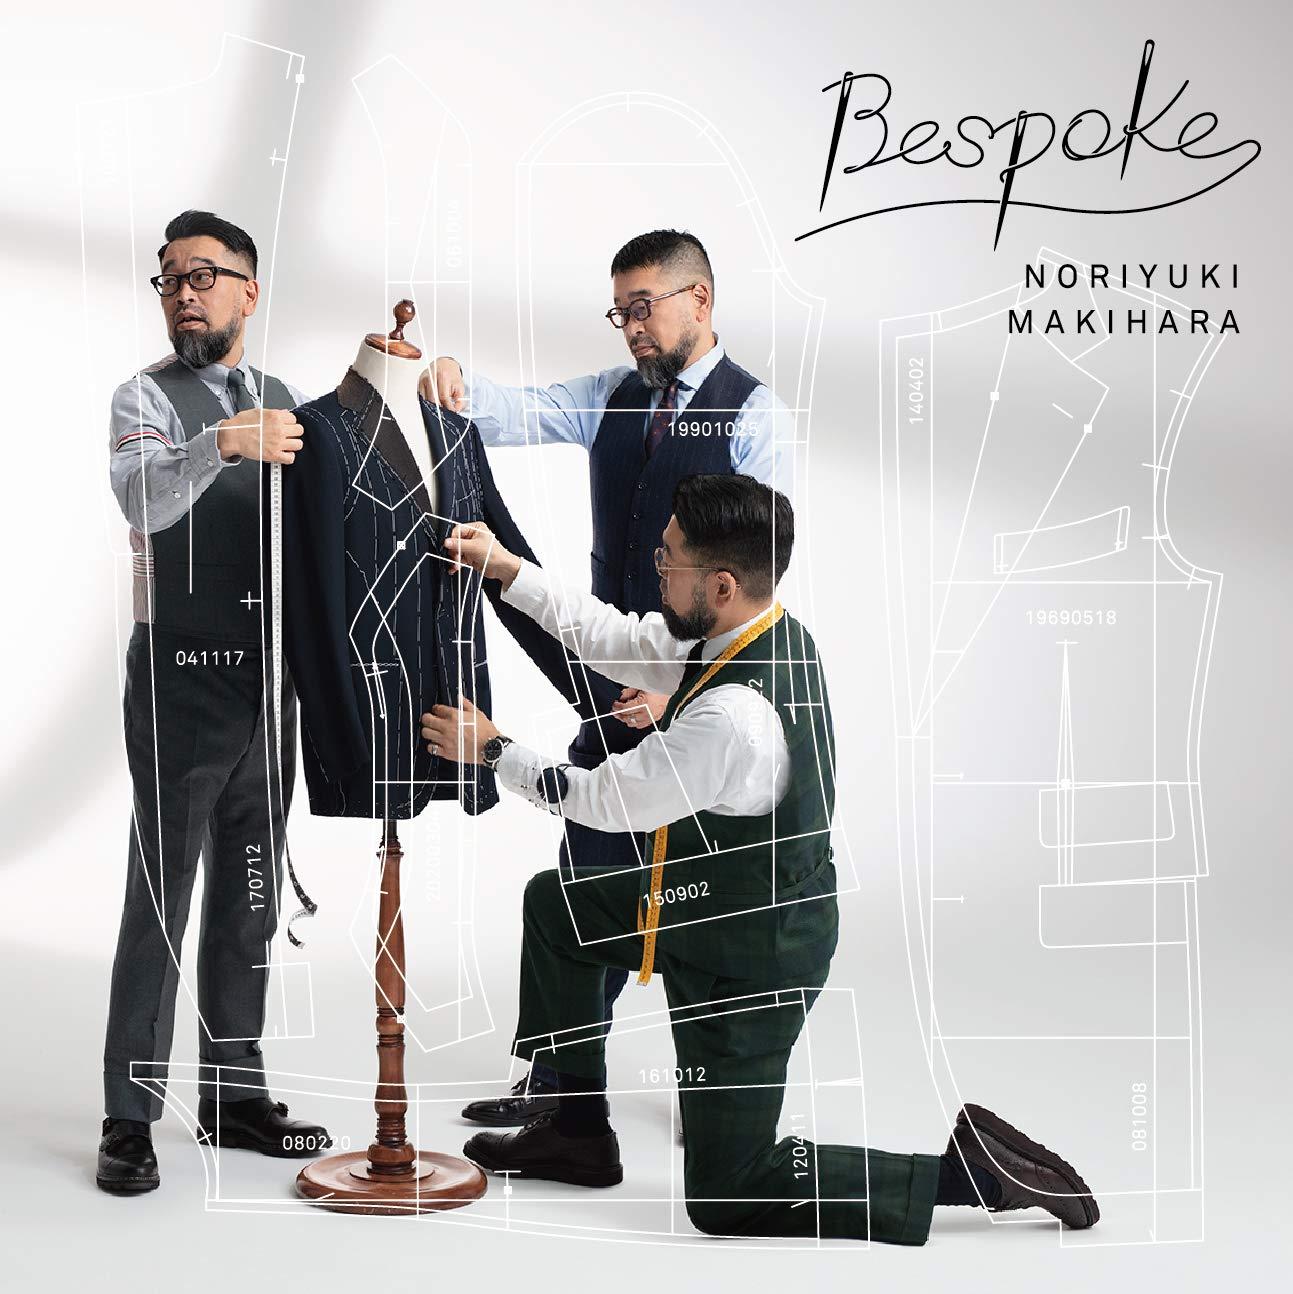 Bespoke (初回生産限定盤) (DVD付) (特典なし)